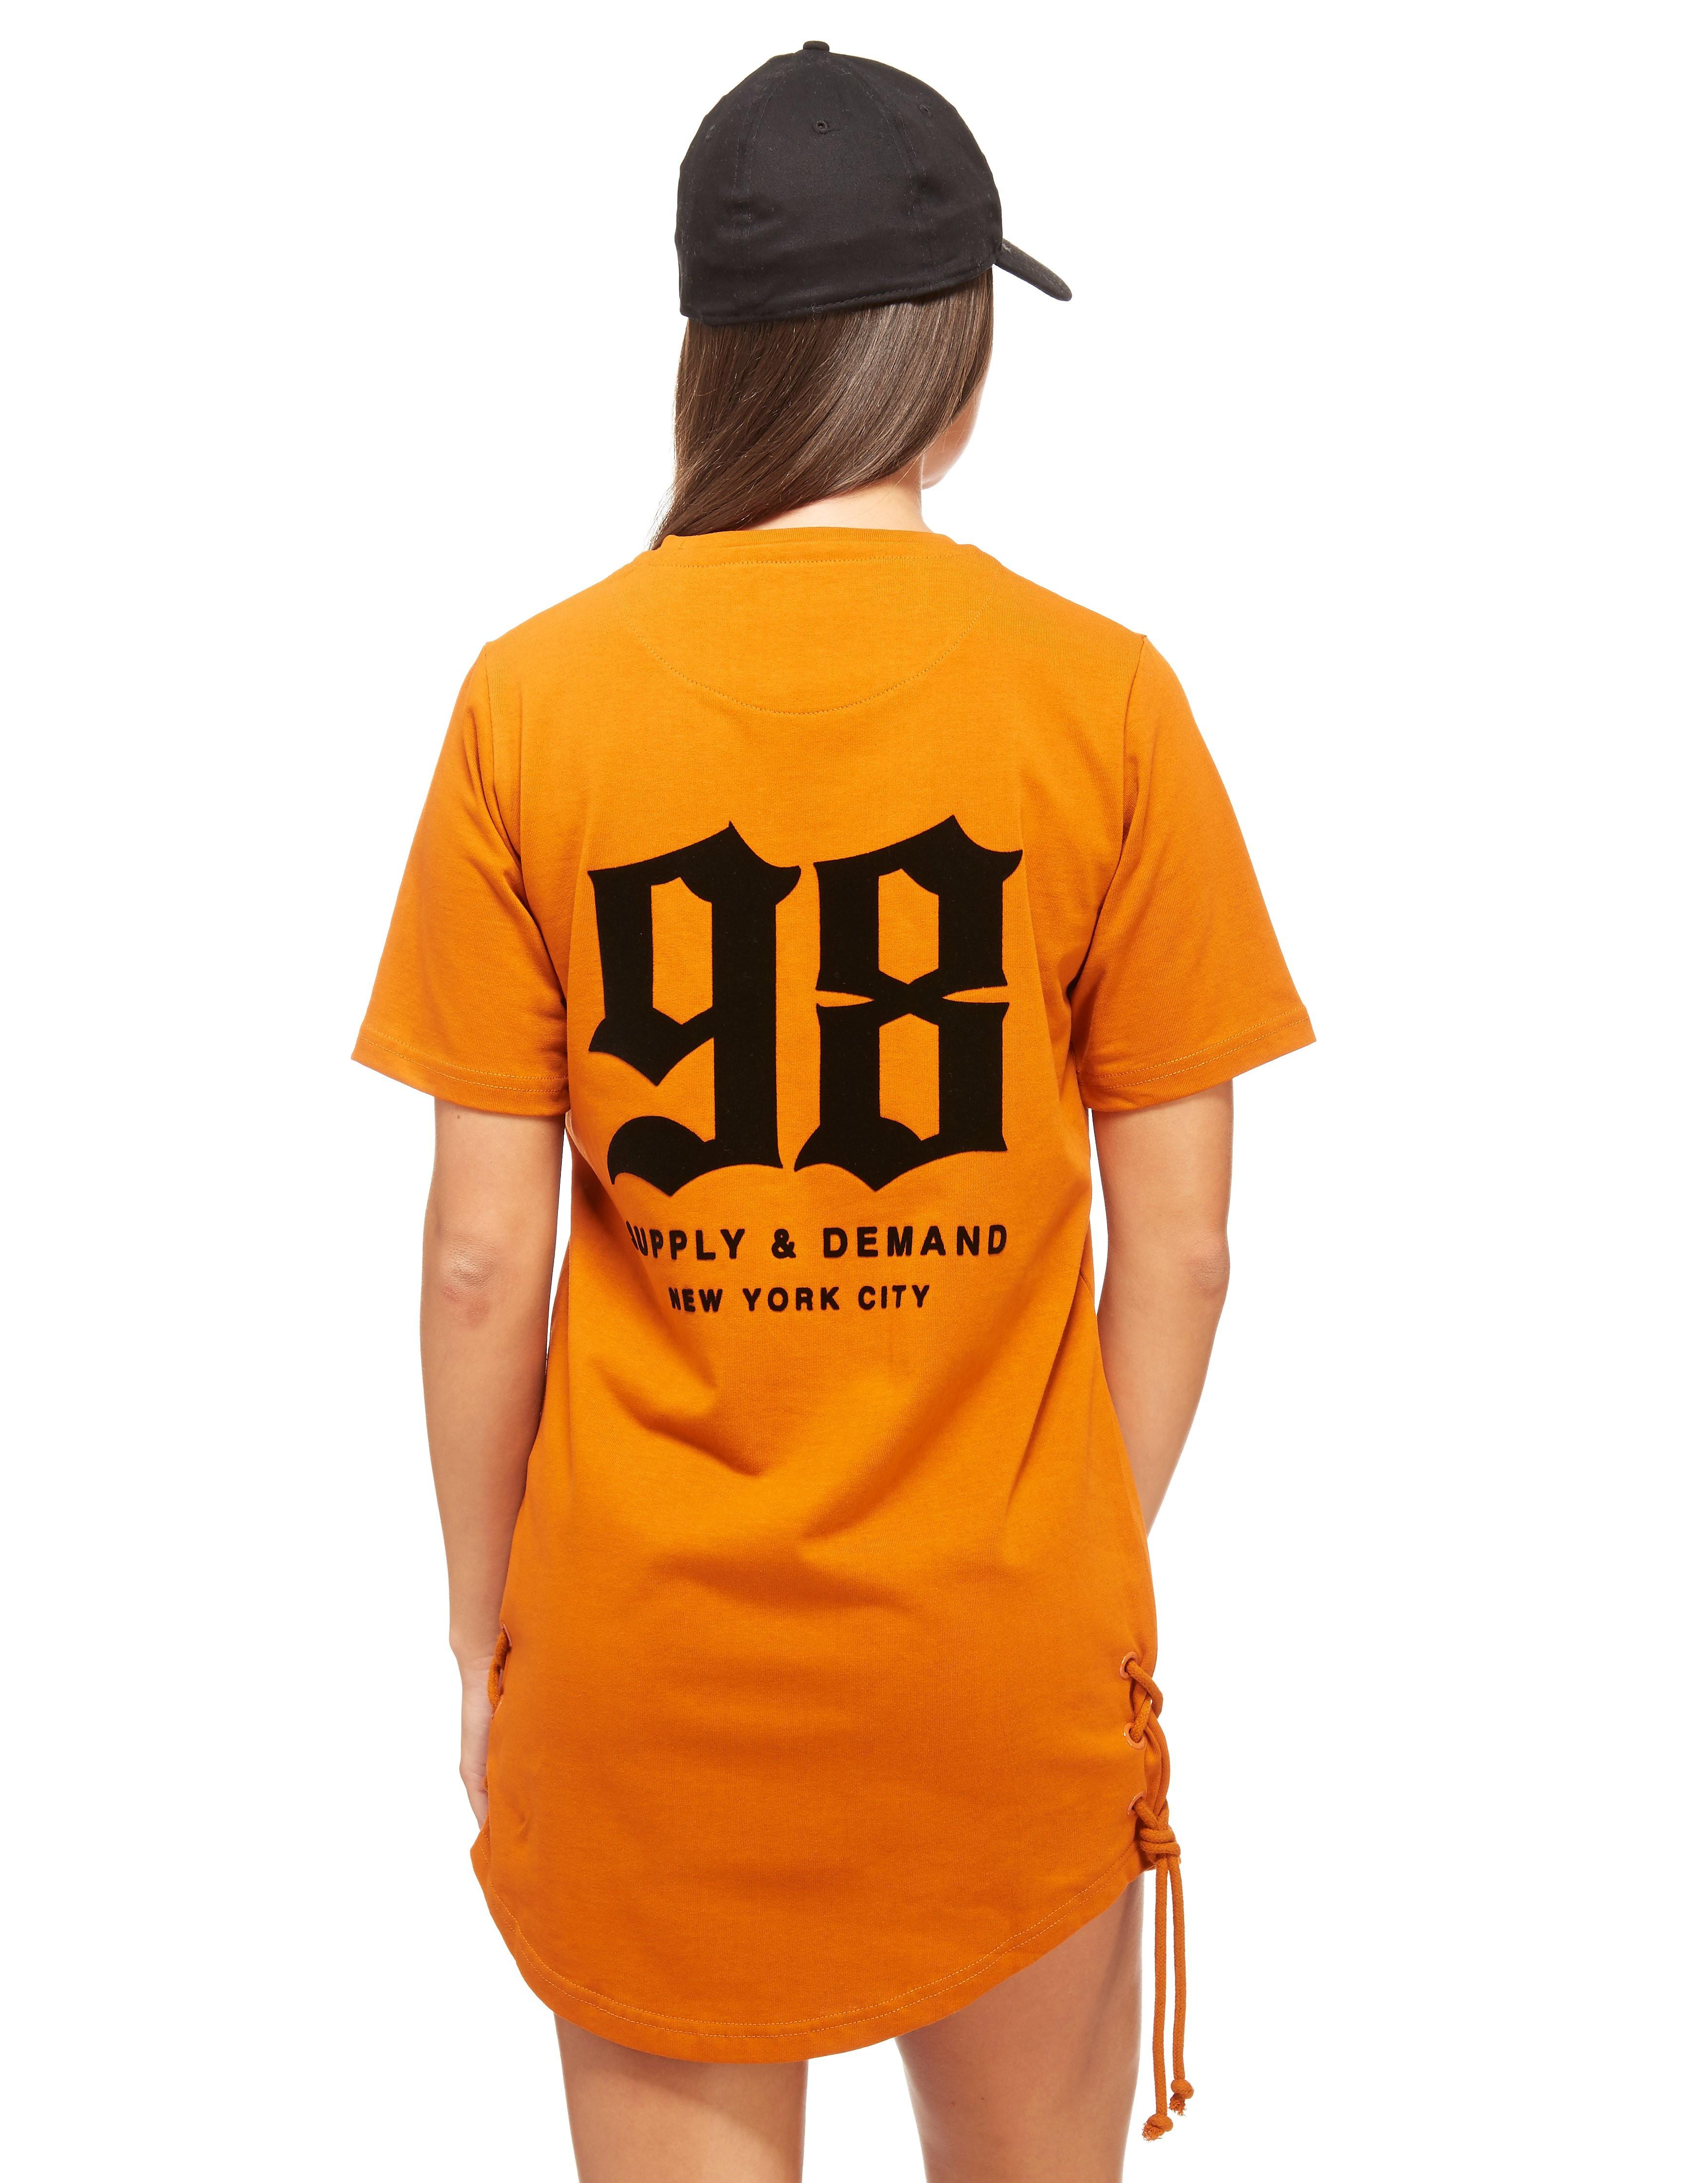 Supply & Demand Longline 98 T-shirt